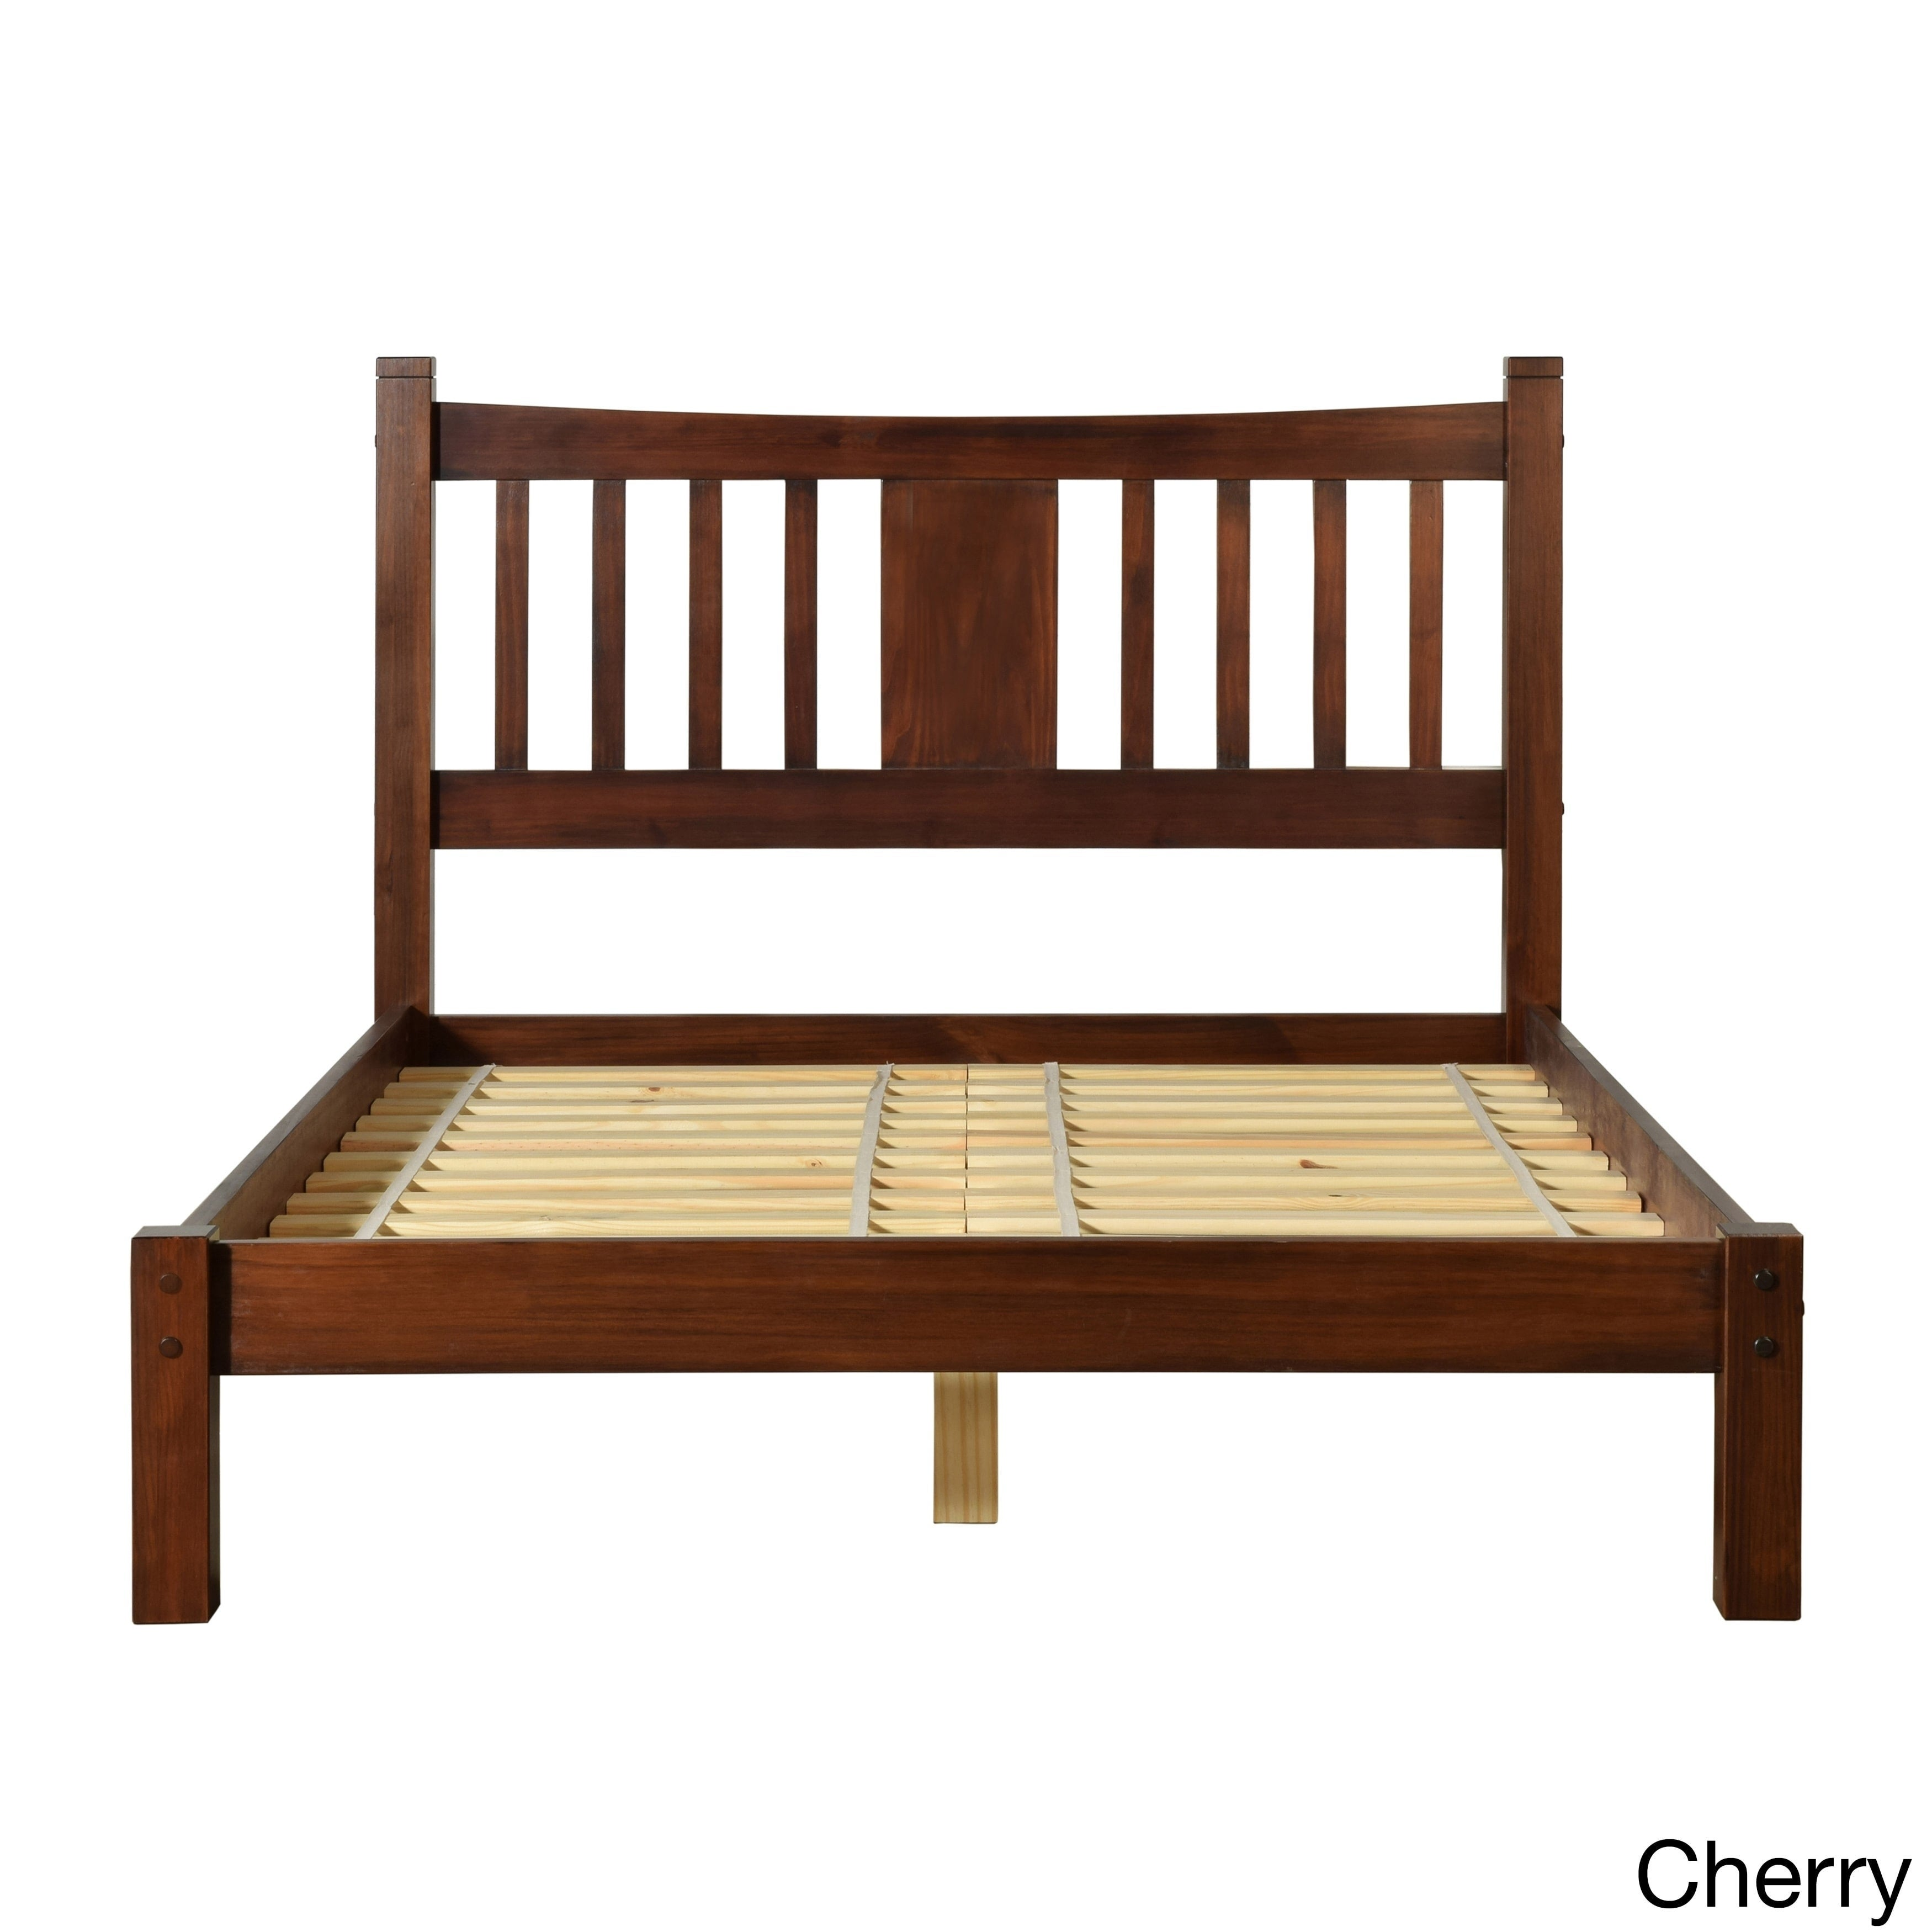 Grain Wood Furniture Shaker Queen Slat Platform Bed solid...